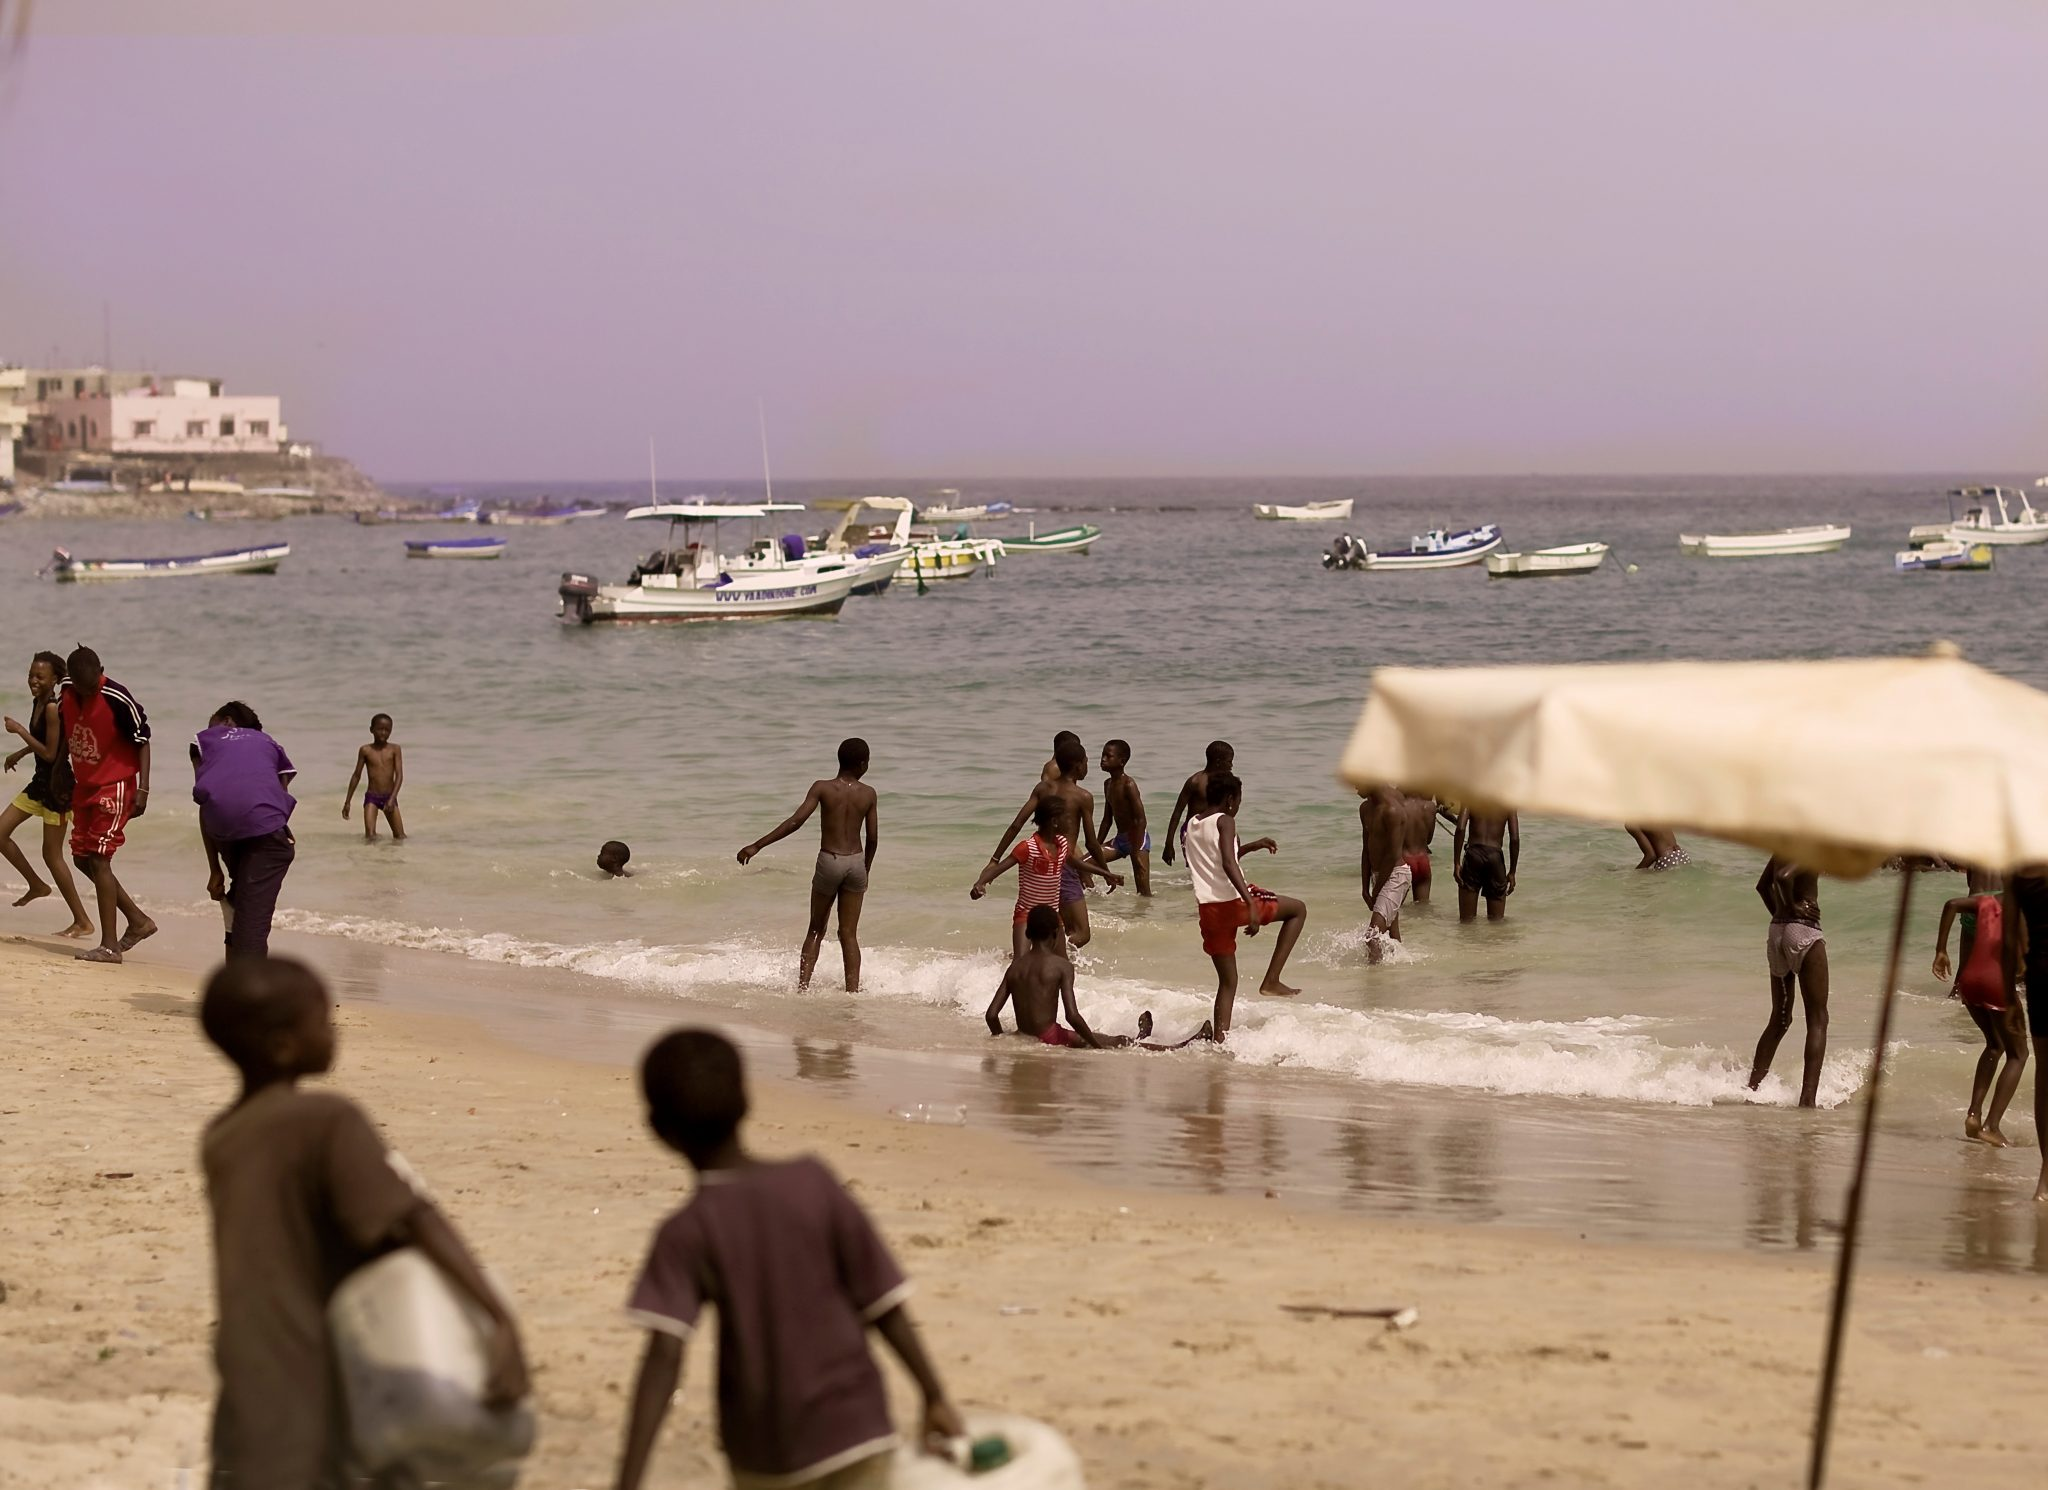 Outside the Terminal in Dakar